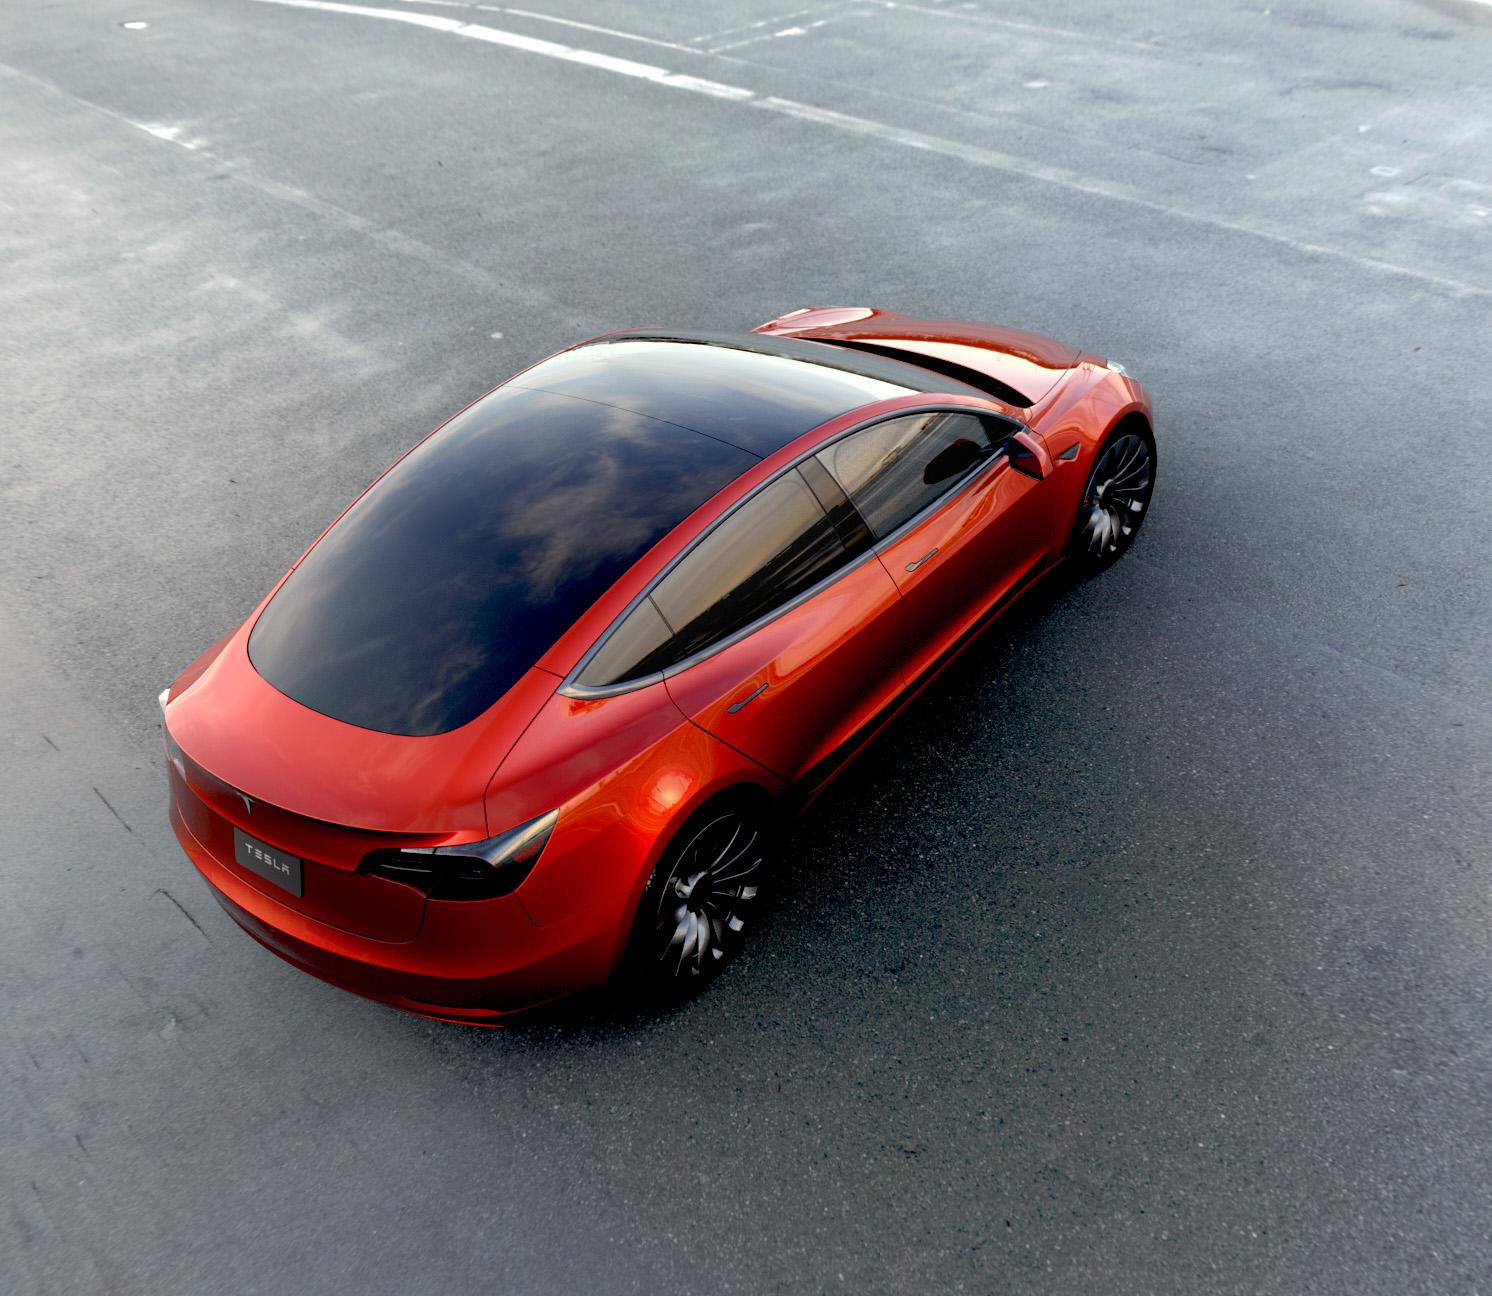 Free Download Tesla Model 3 Wallpapers Galore 1492x1296